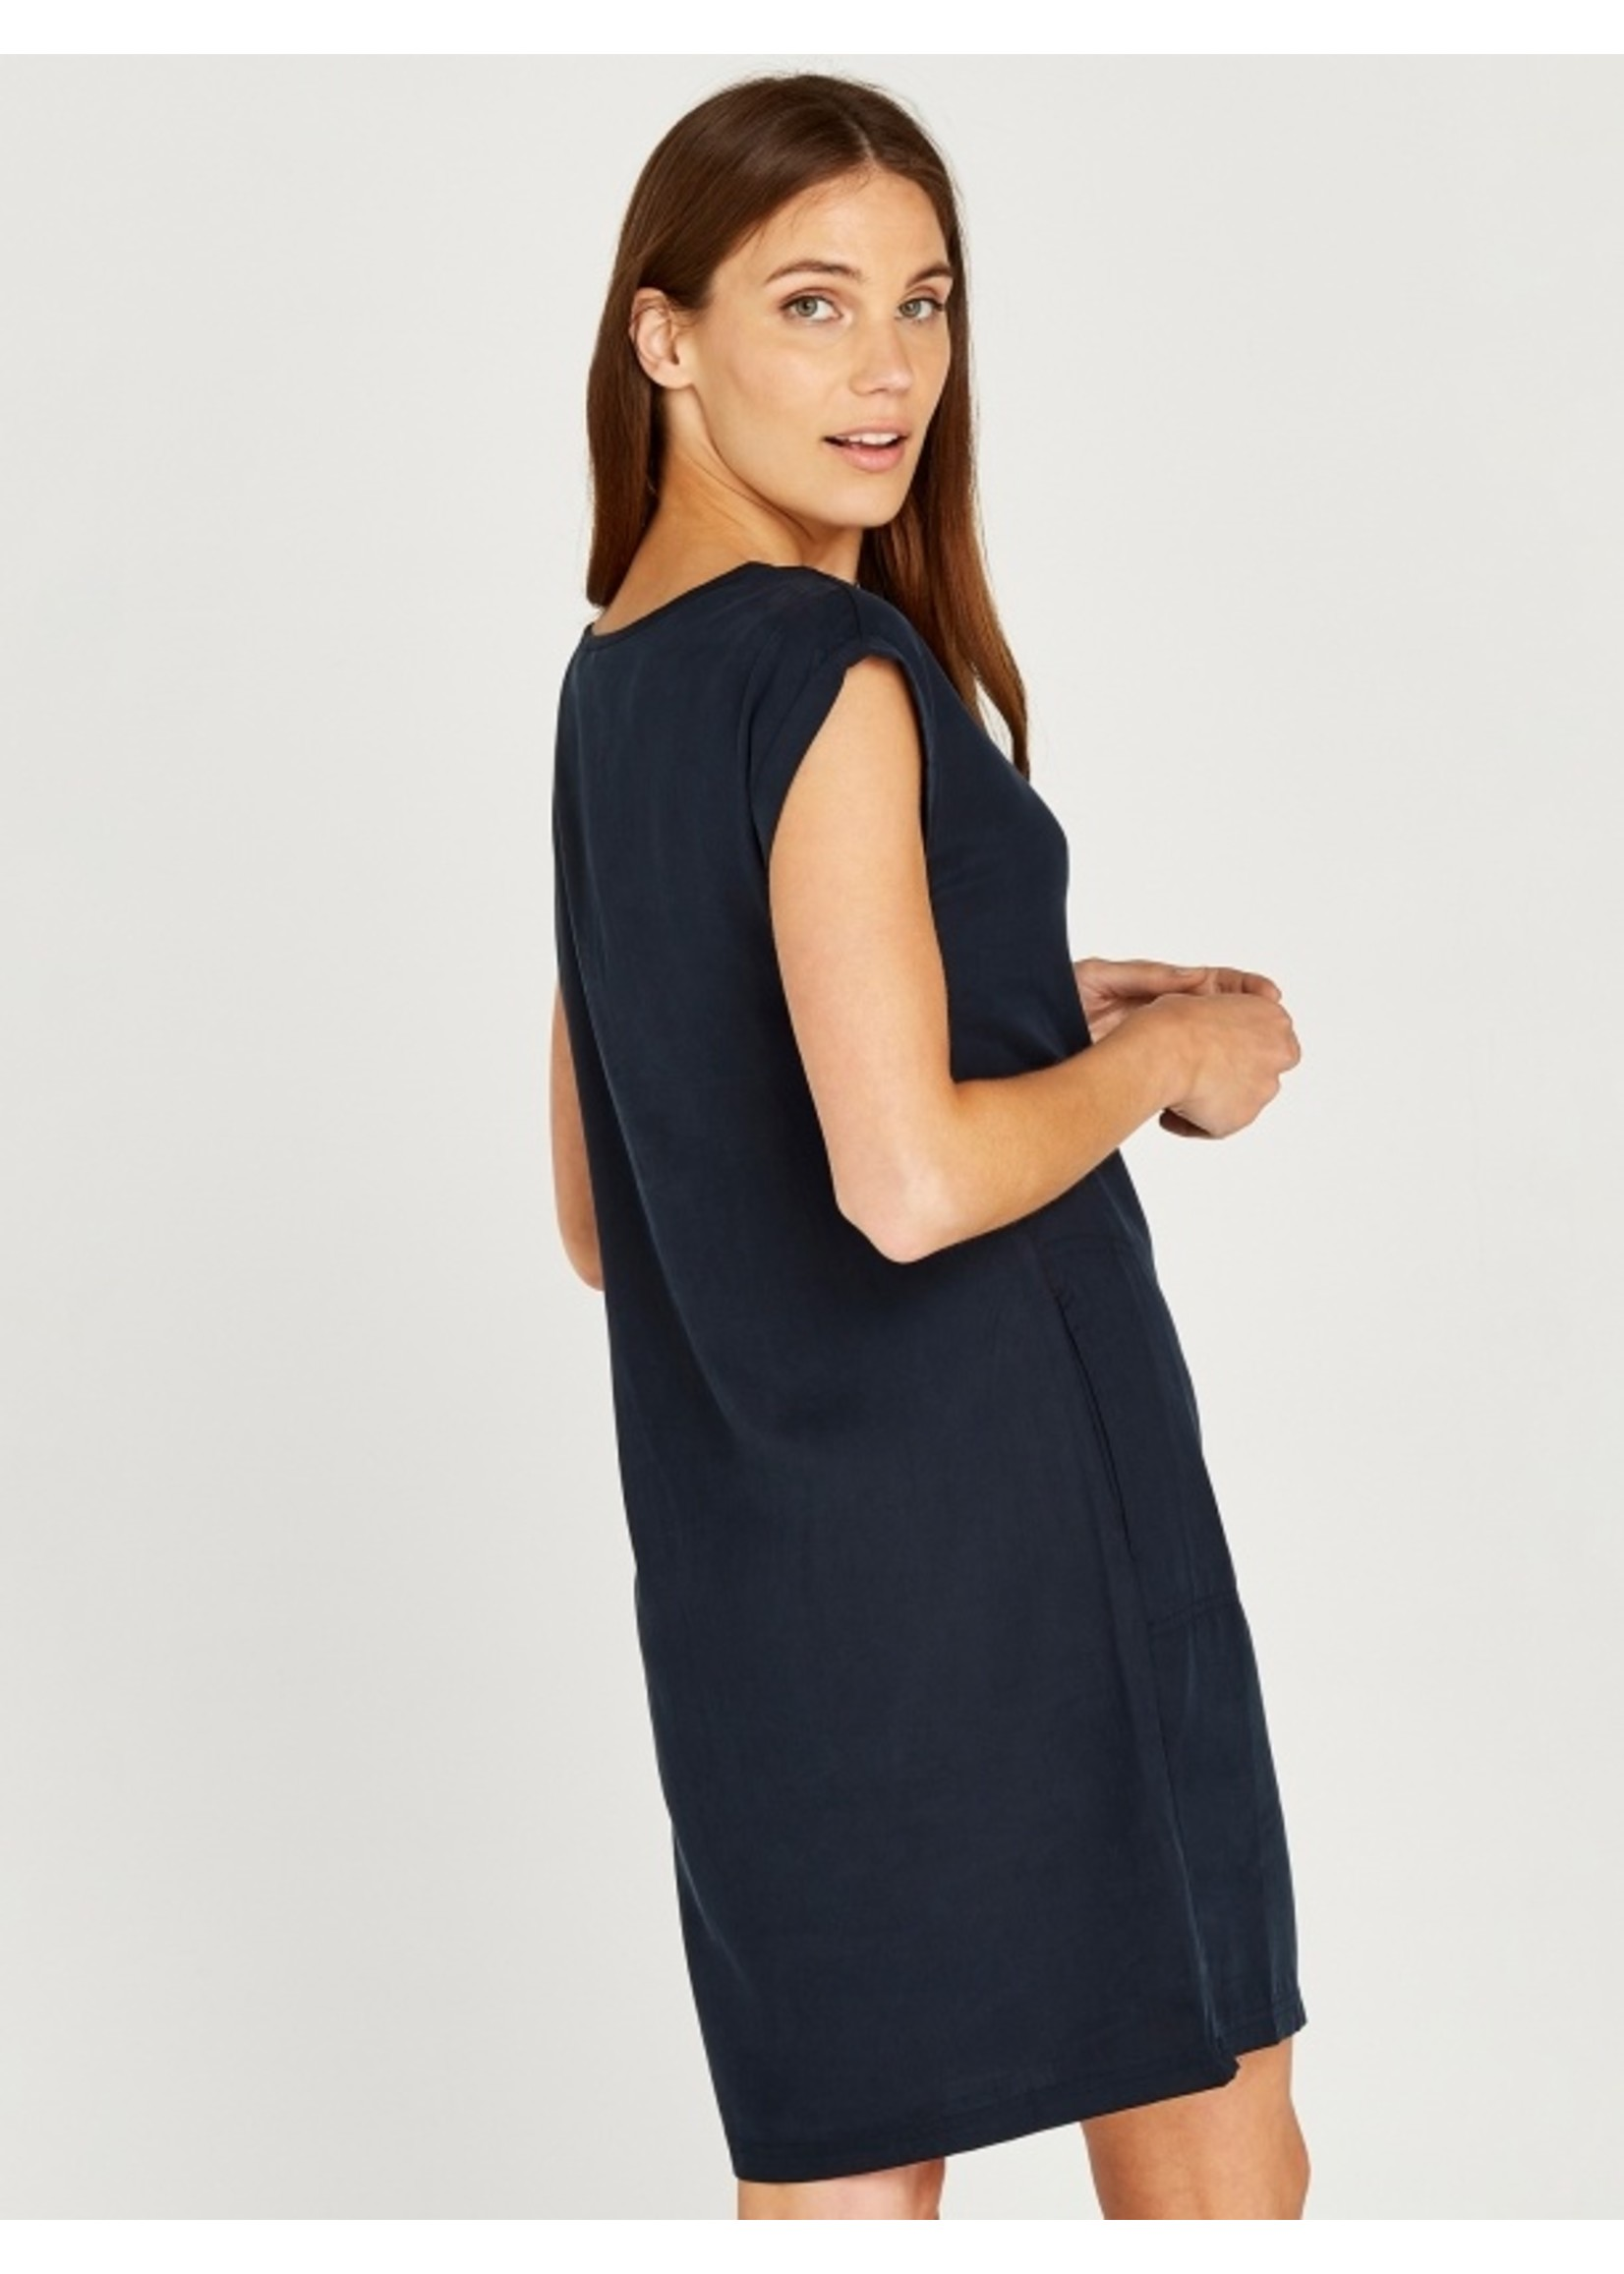 Apricot 2 Side Pocket Turn Up Sleeve Dress